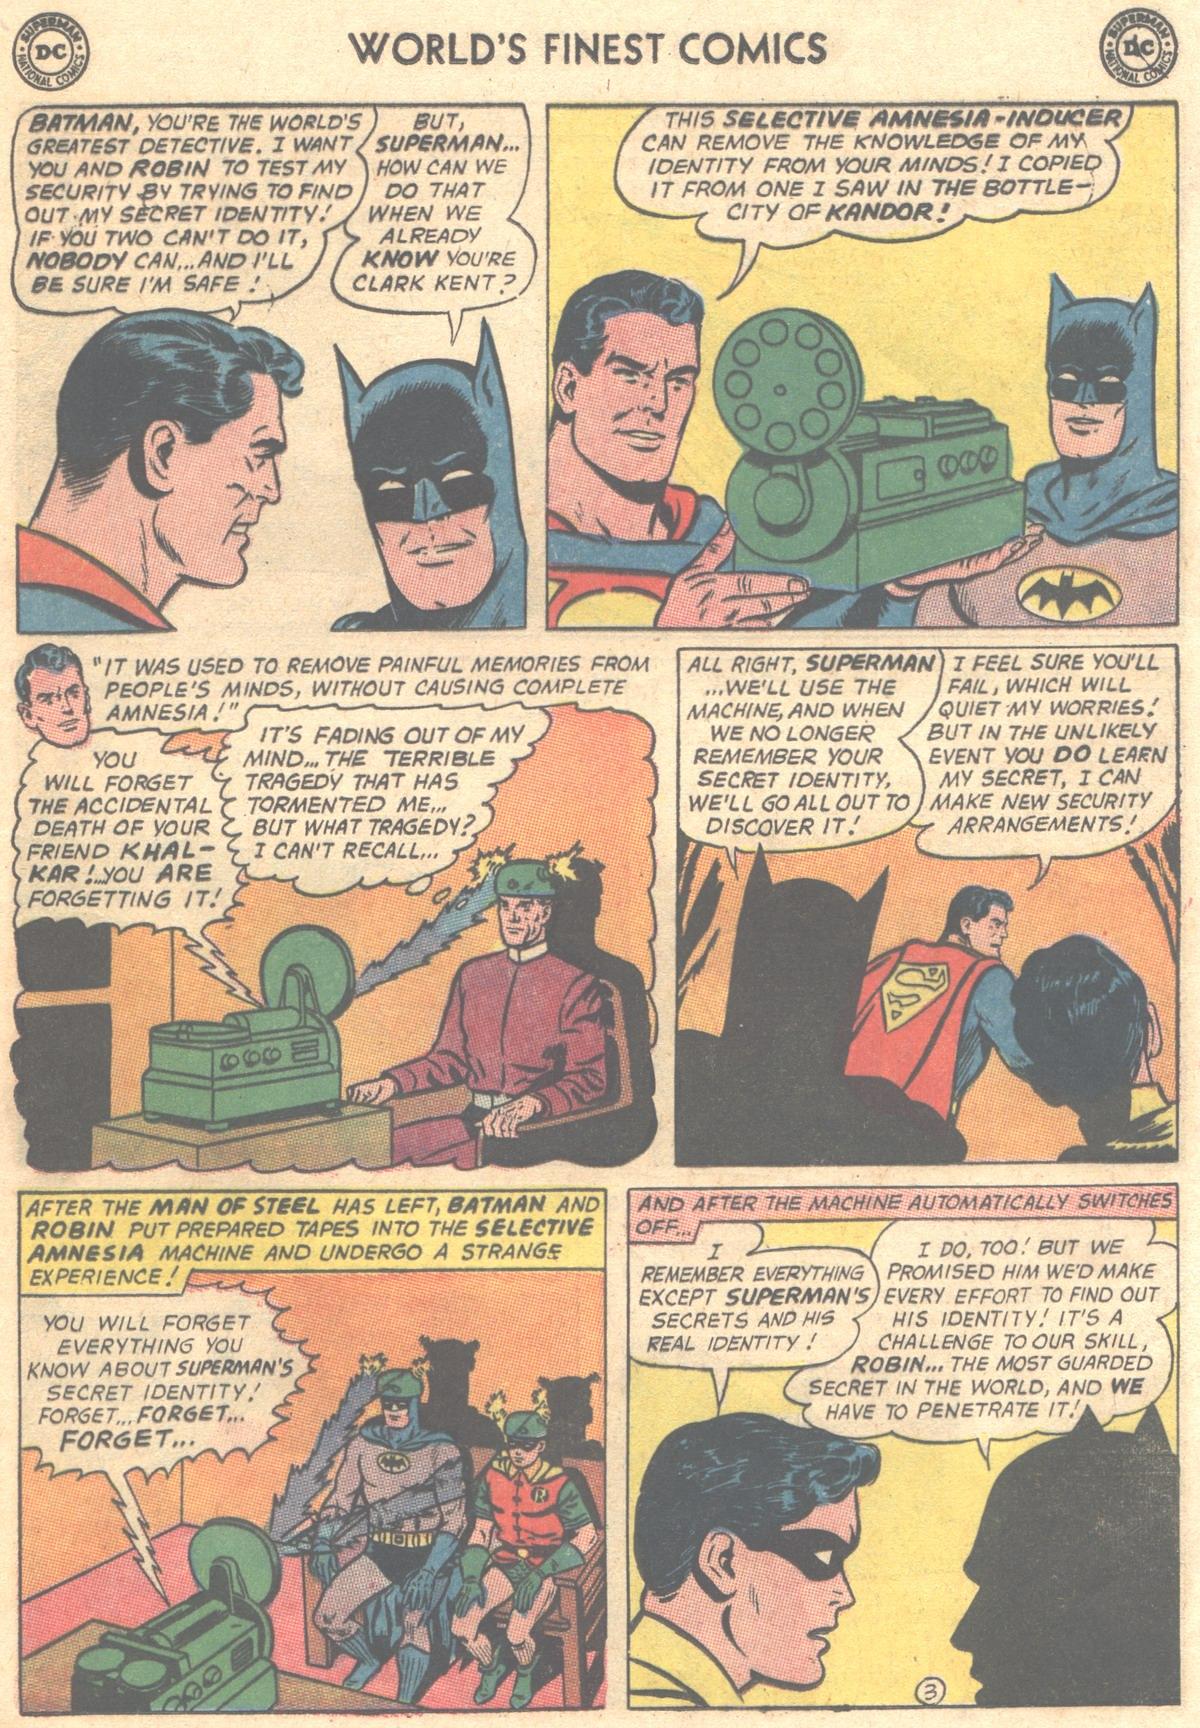 Read online World's Finest Comics comic -  Issue #149 - 5